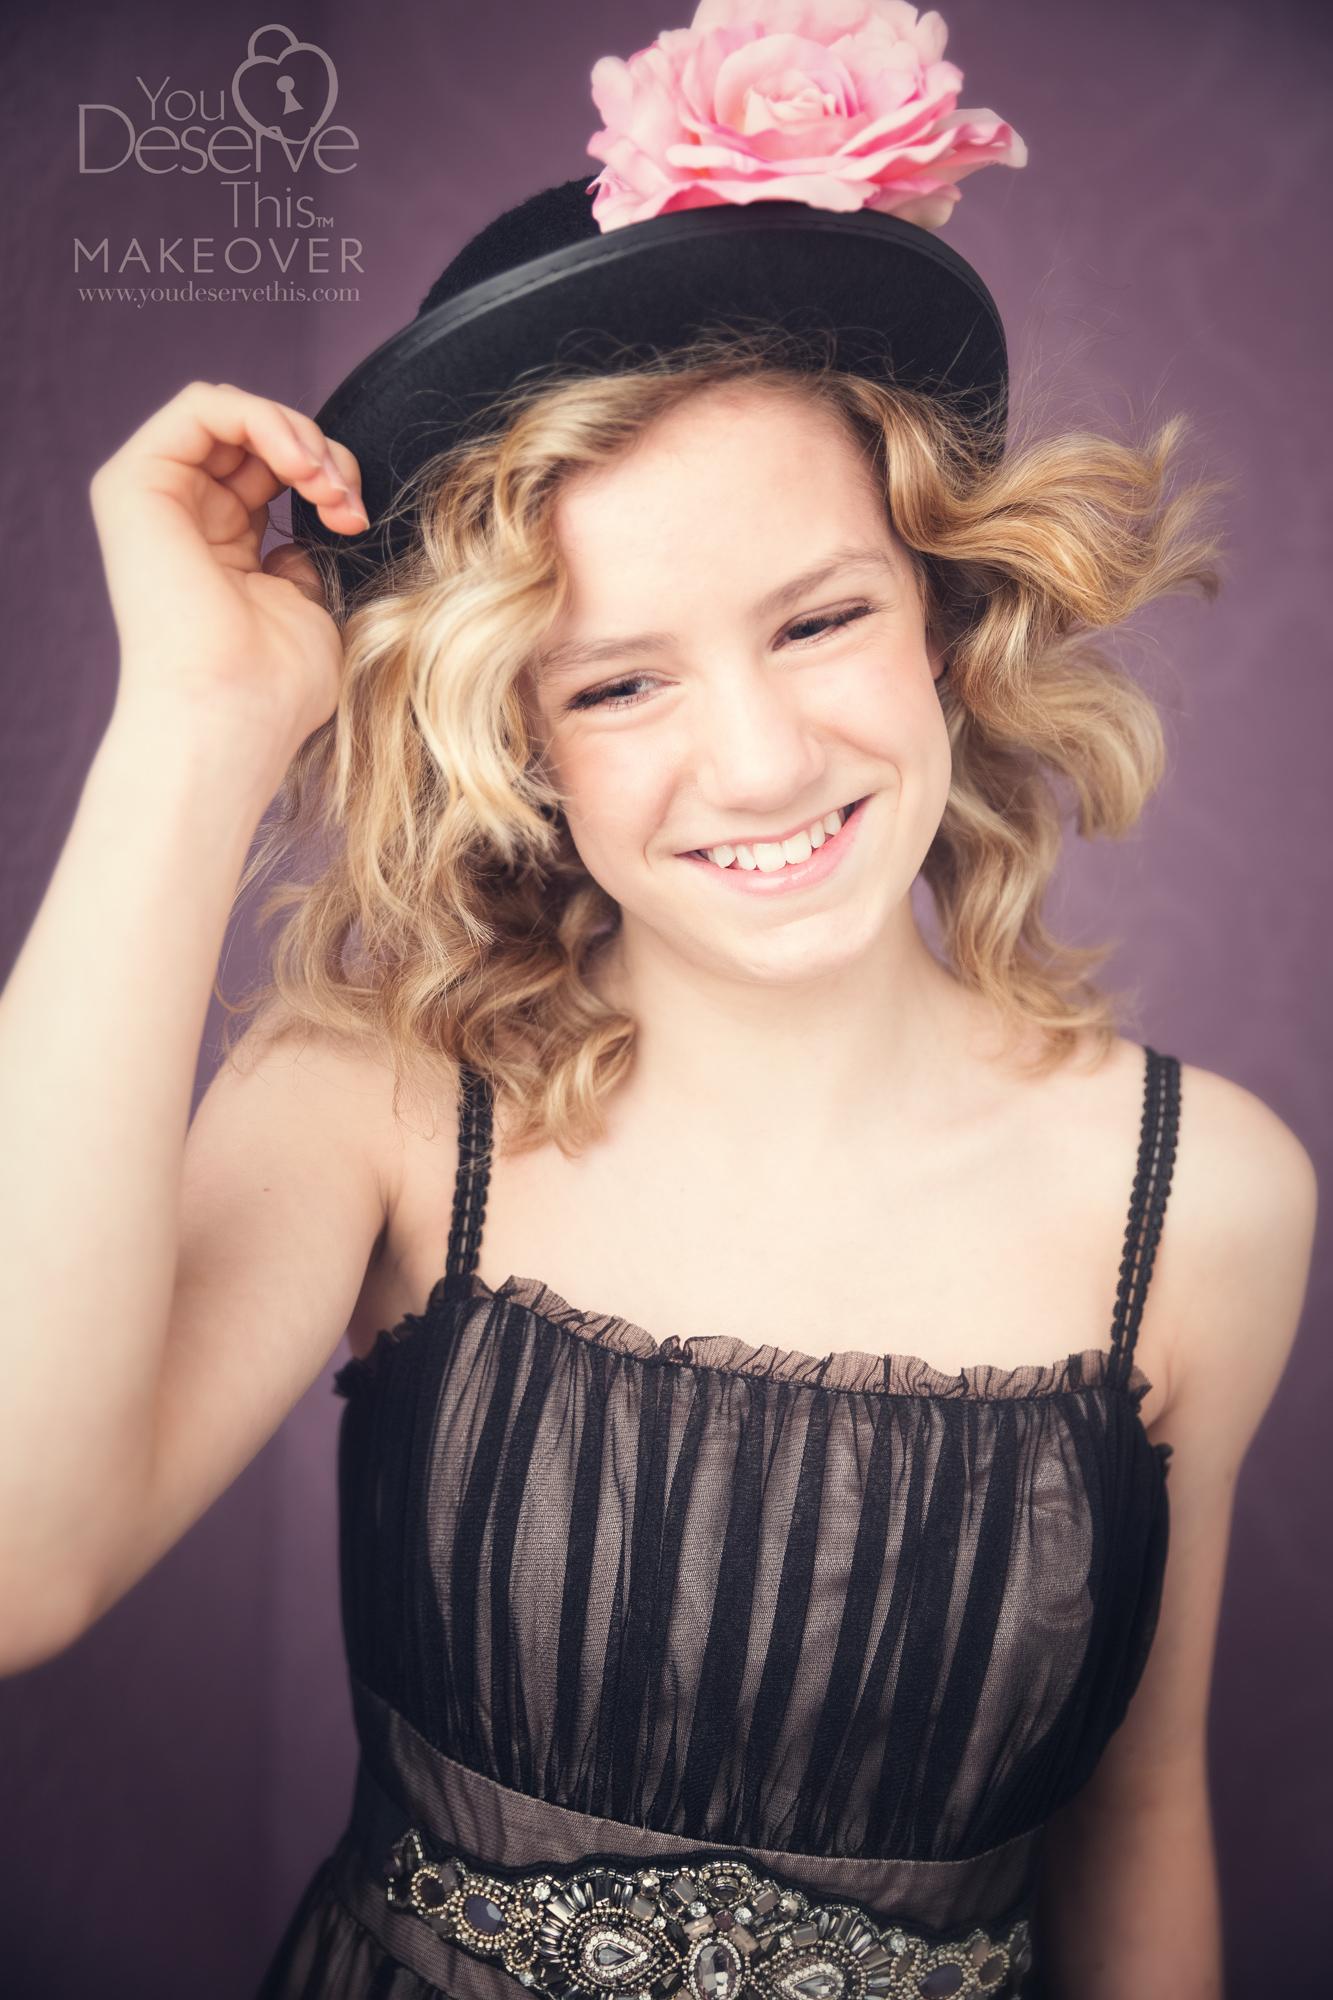 Amber had a mini photo shoot aged 11